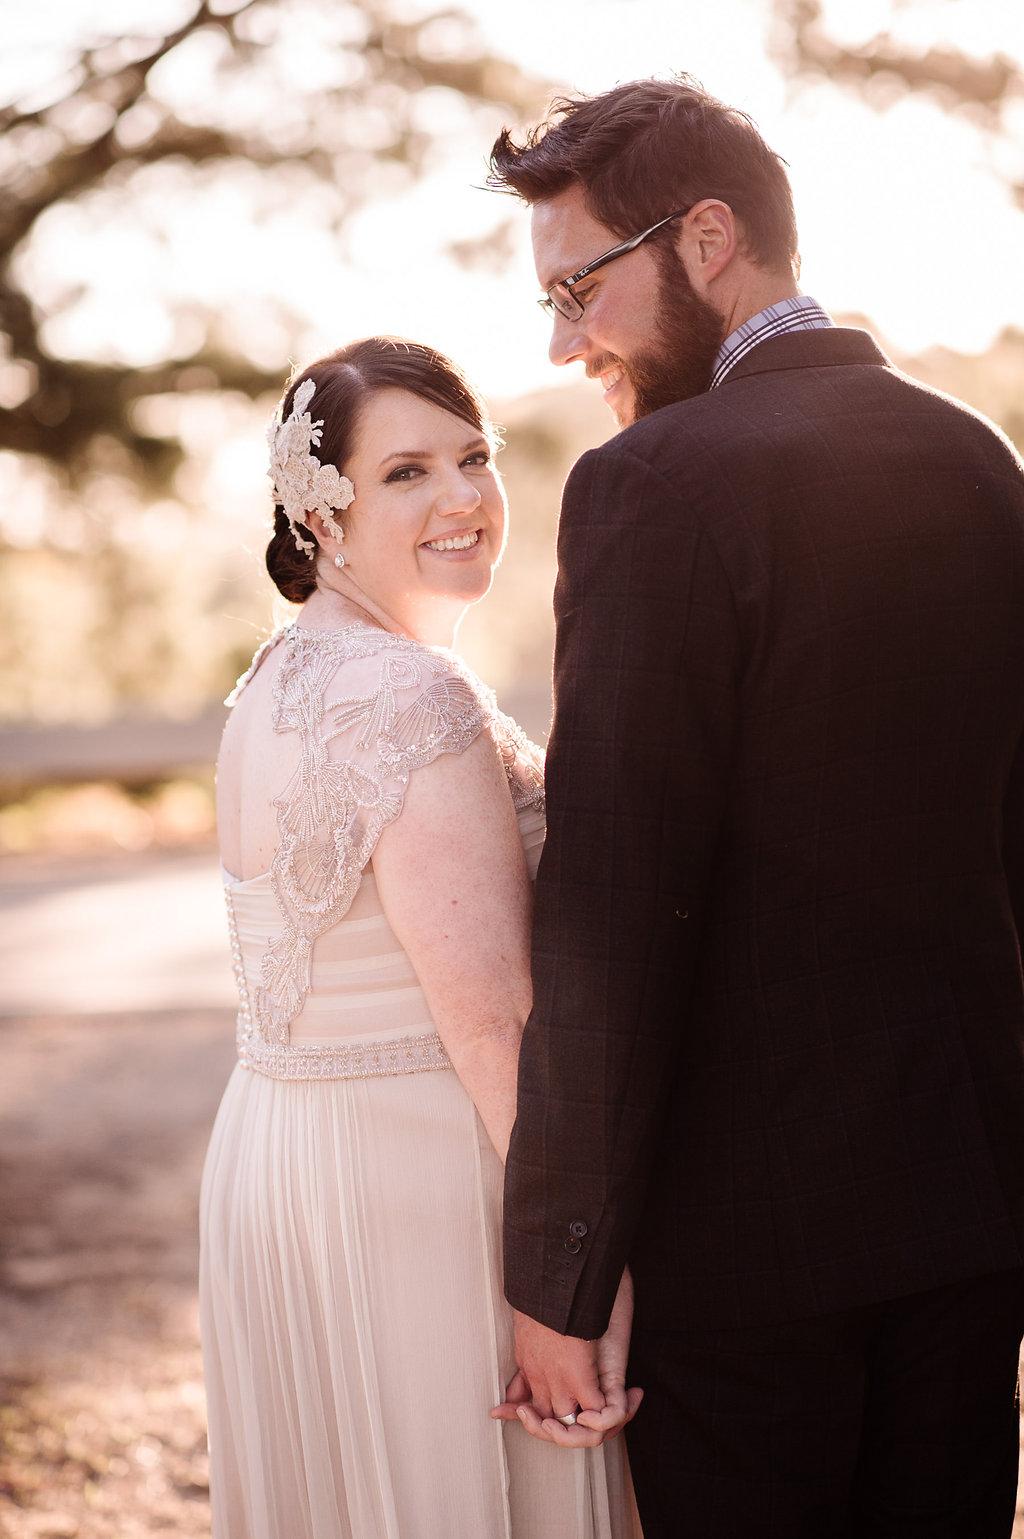 Ophelia Gwendolynne wedding dress Erin - image -jerome cole1.jpg